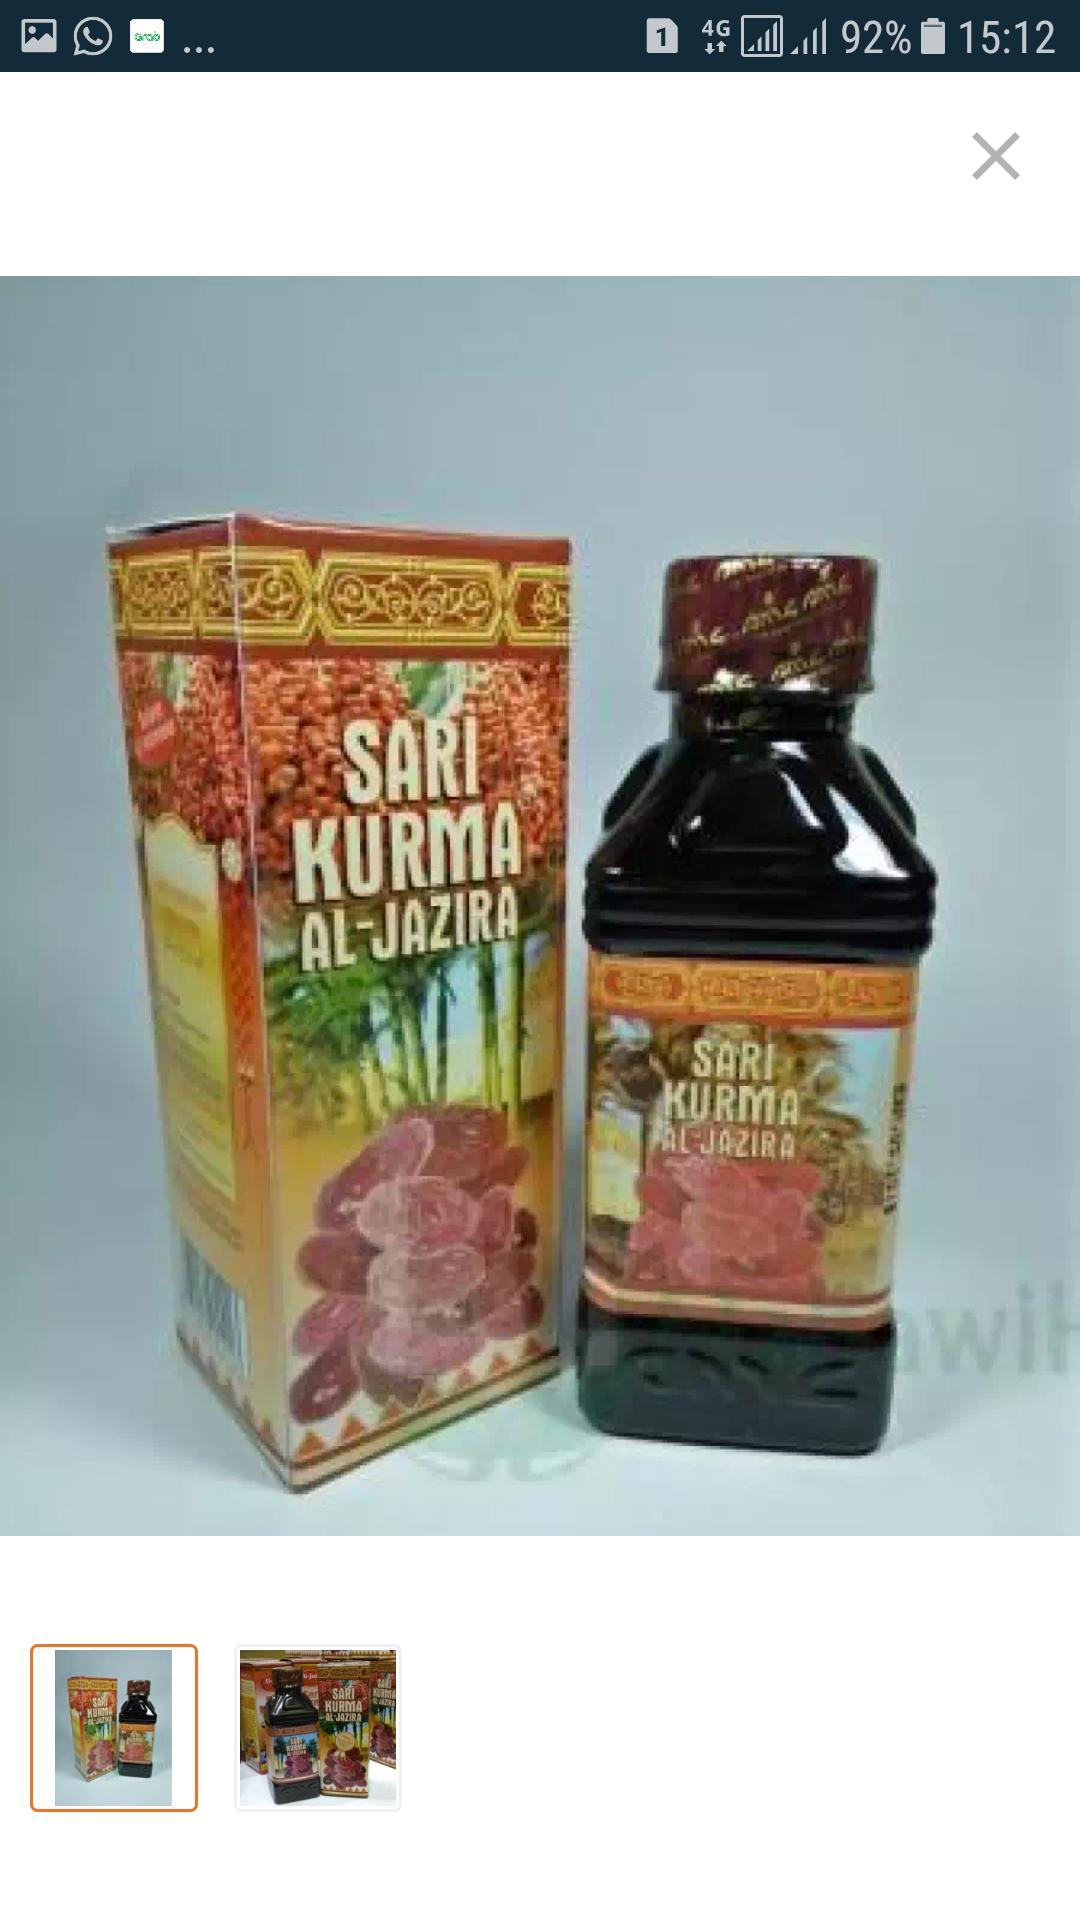 Buy Sell Cheapest Sari Kurma Alsabira Best Quality Product Deals Muda Pilihan Ruthob Al Jazira